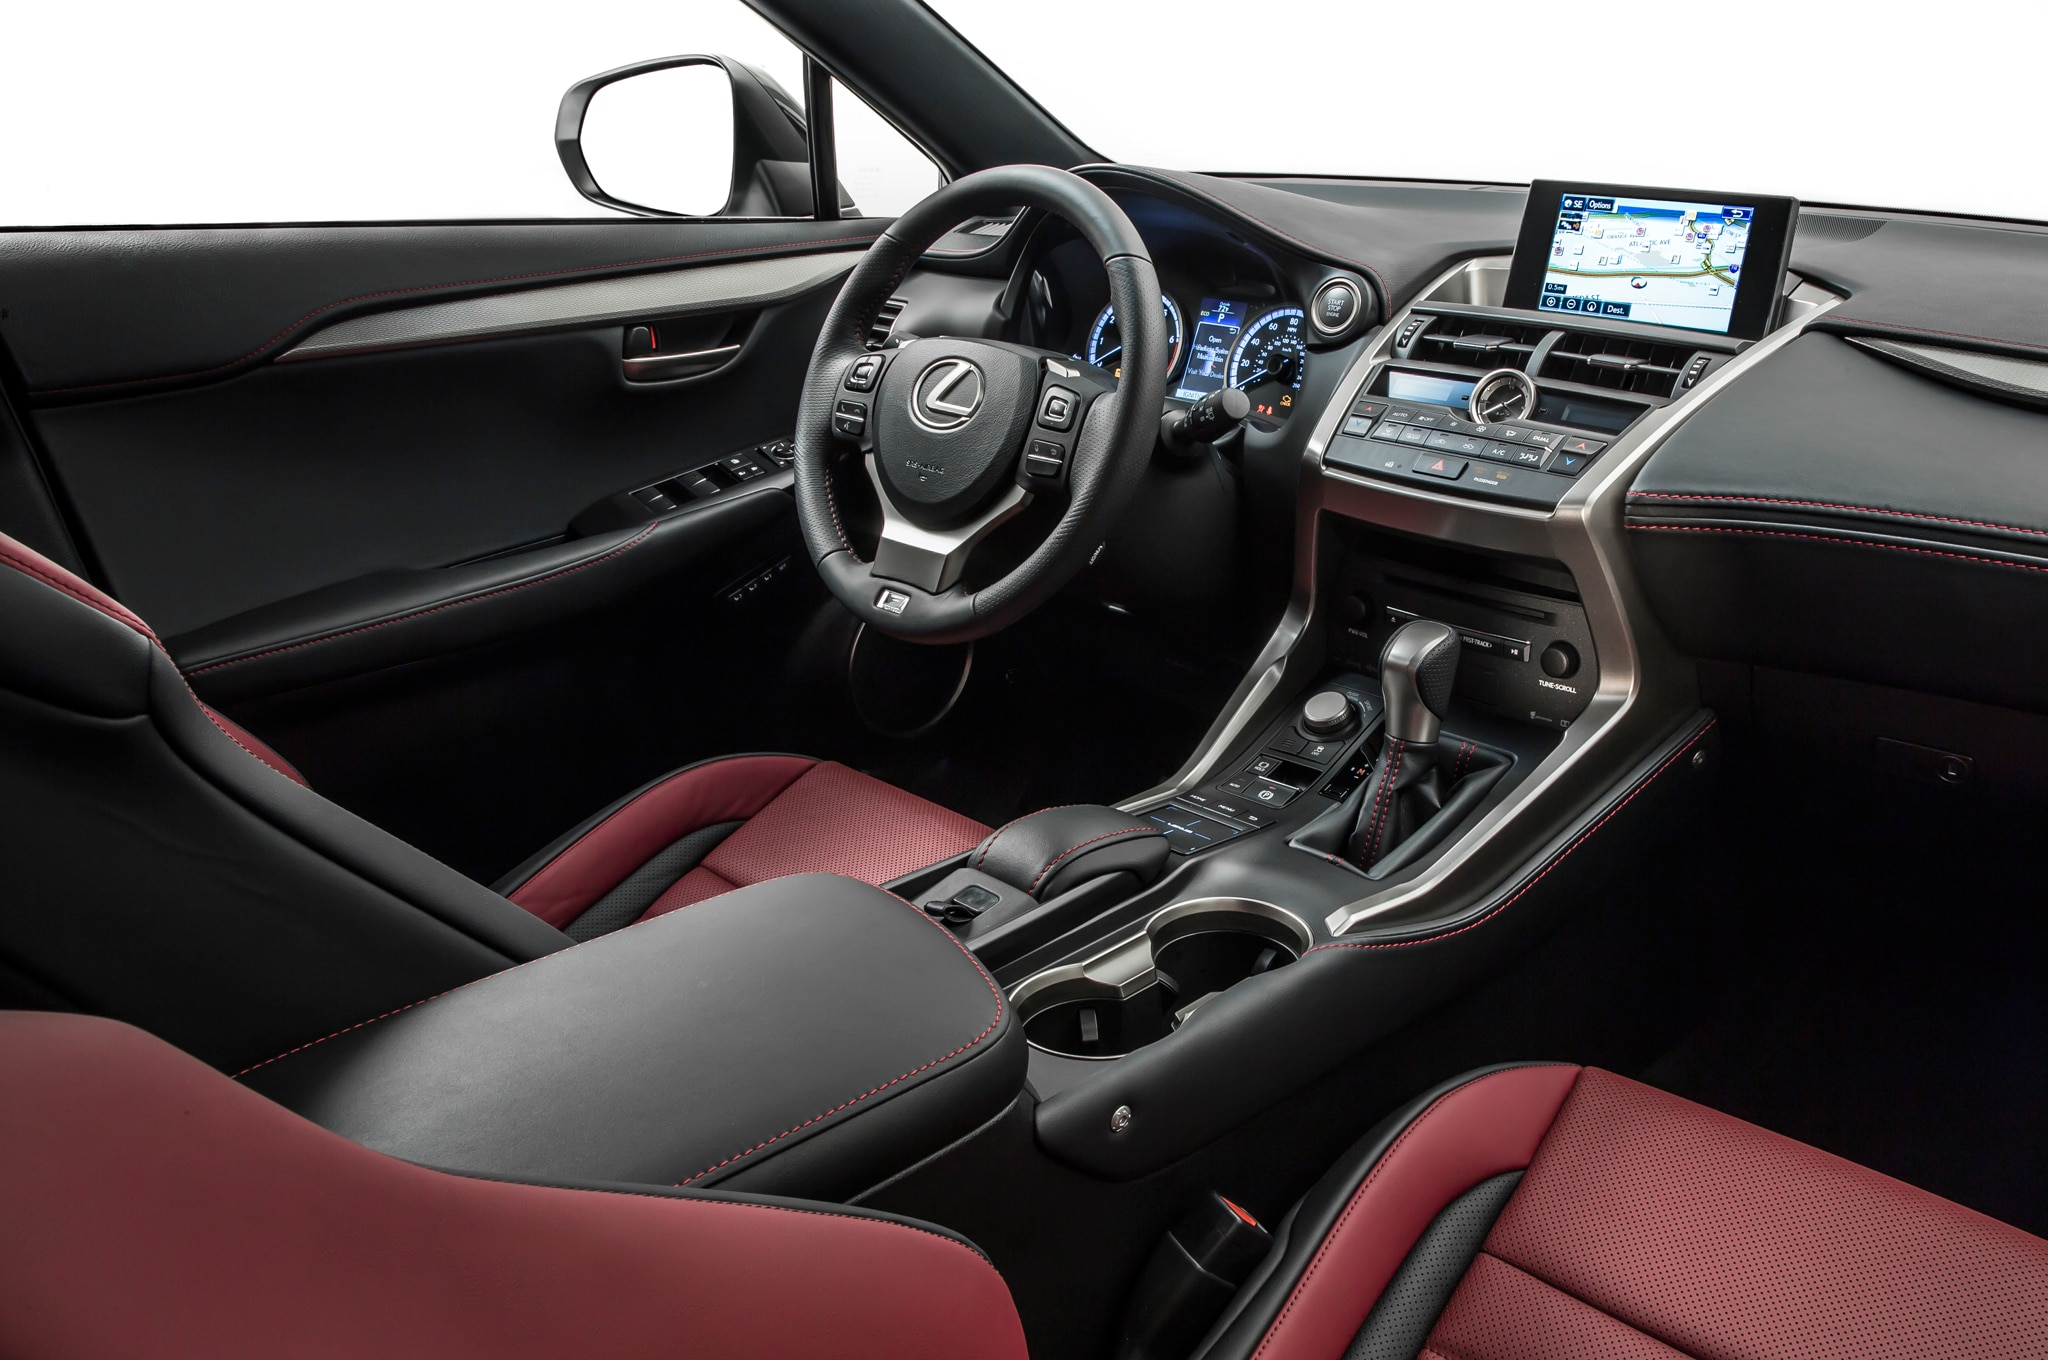 2015 Lexus Nx 200t F Sport Interior Motor Trend En Espanol